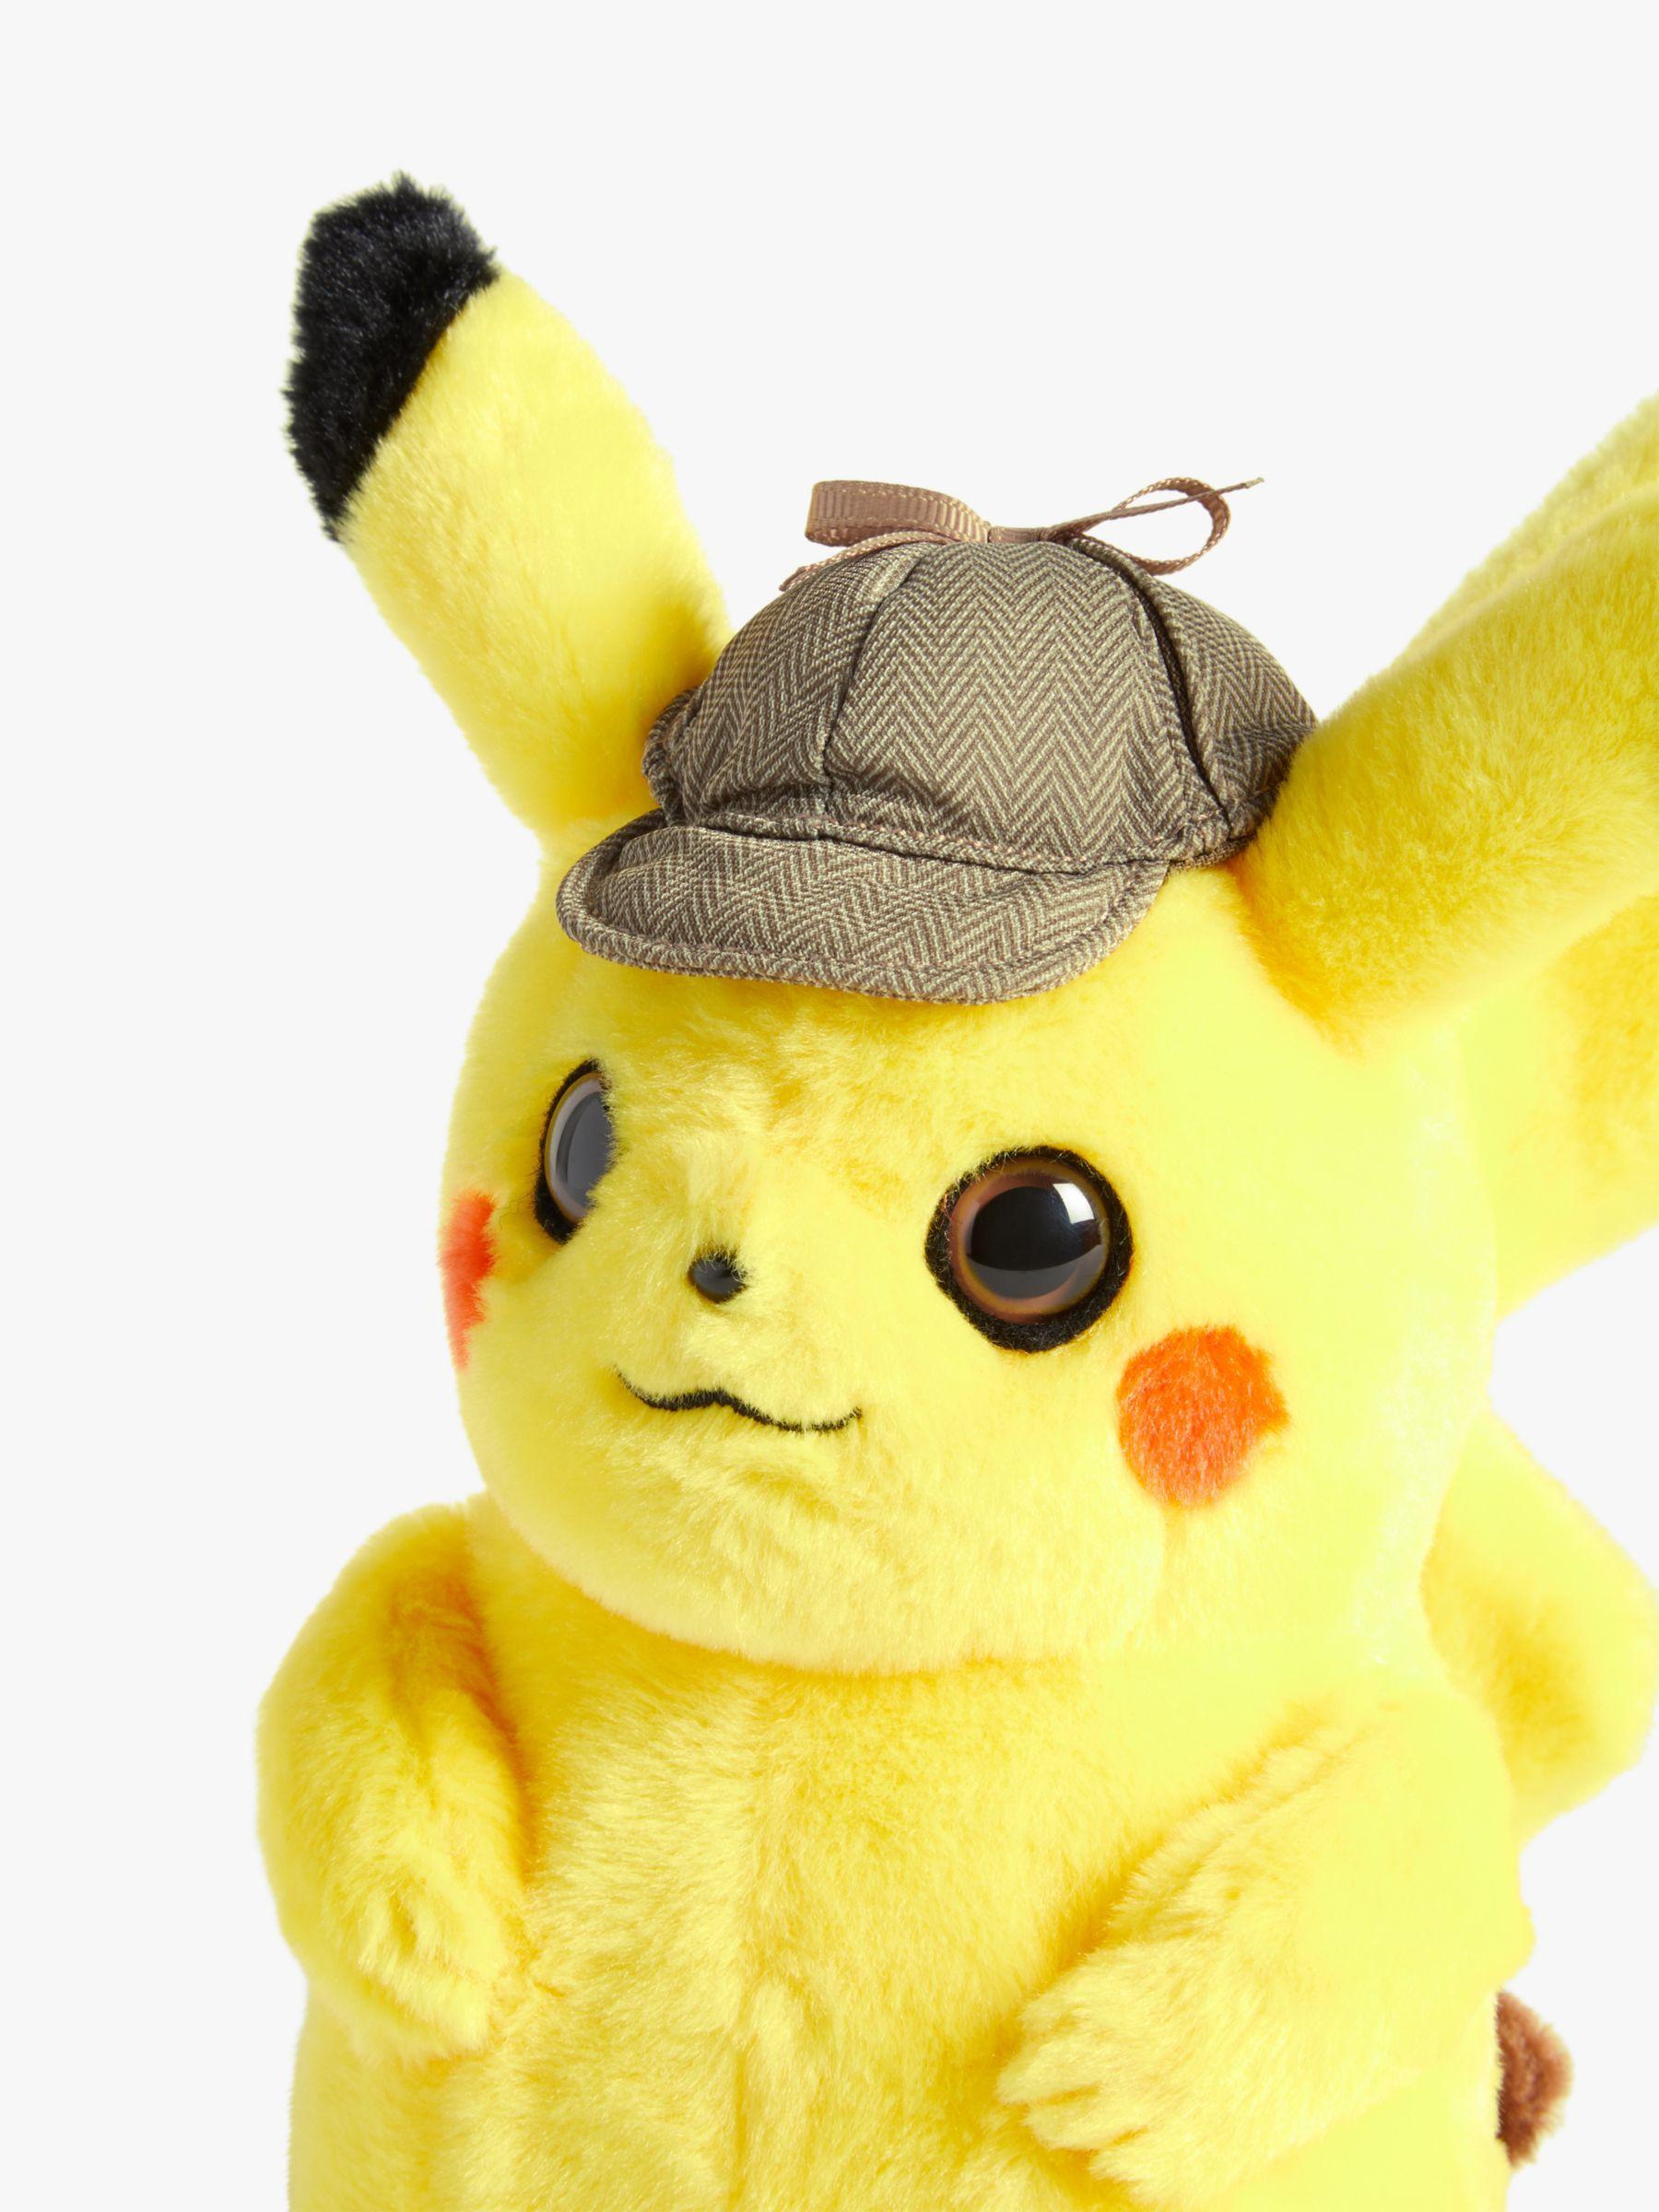 Pokemon Detective 8 Pikachu Plush Soft Toy In 2020 Pokemon